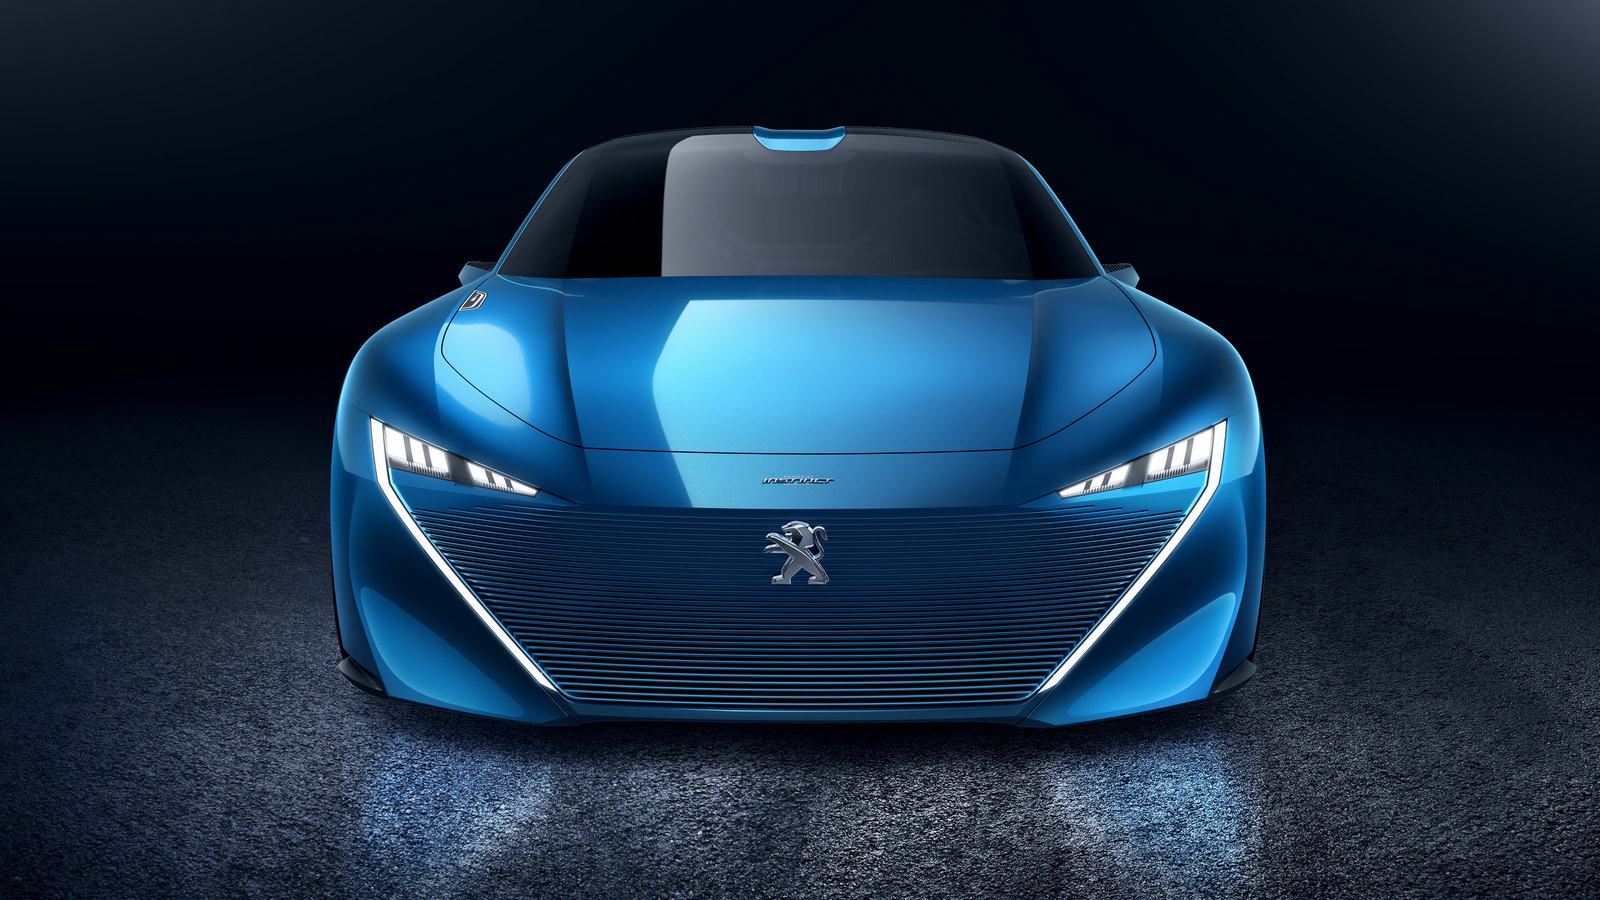 2017-Peugeot-Instinct-Concept-03